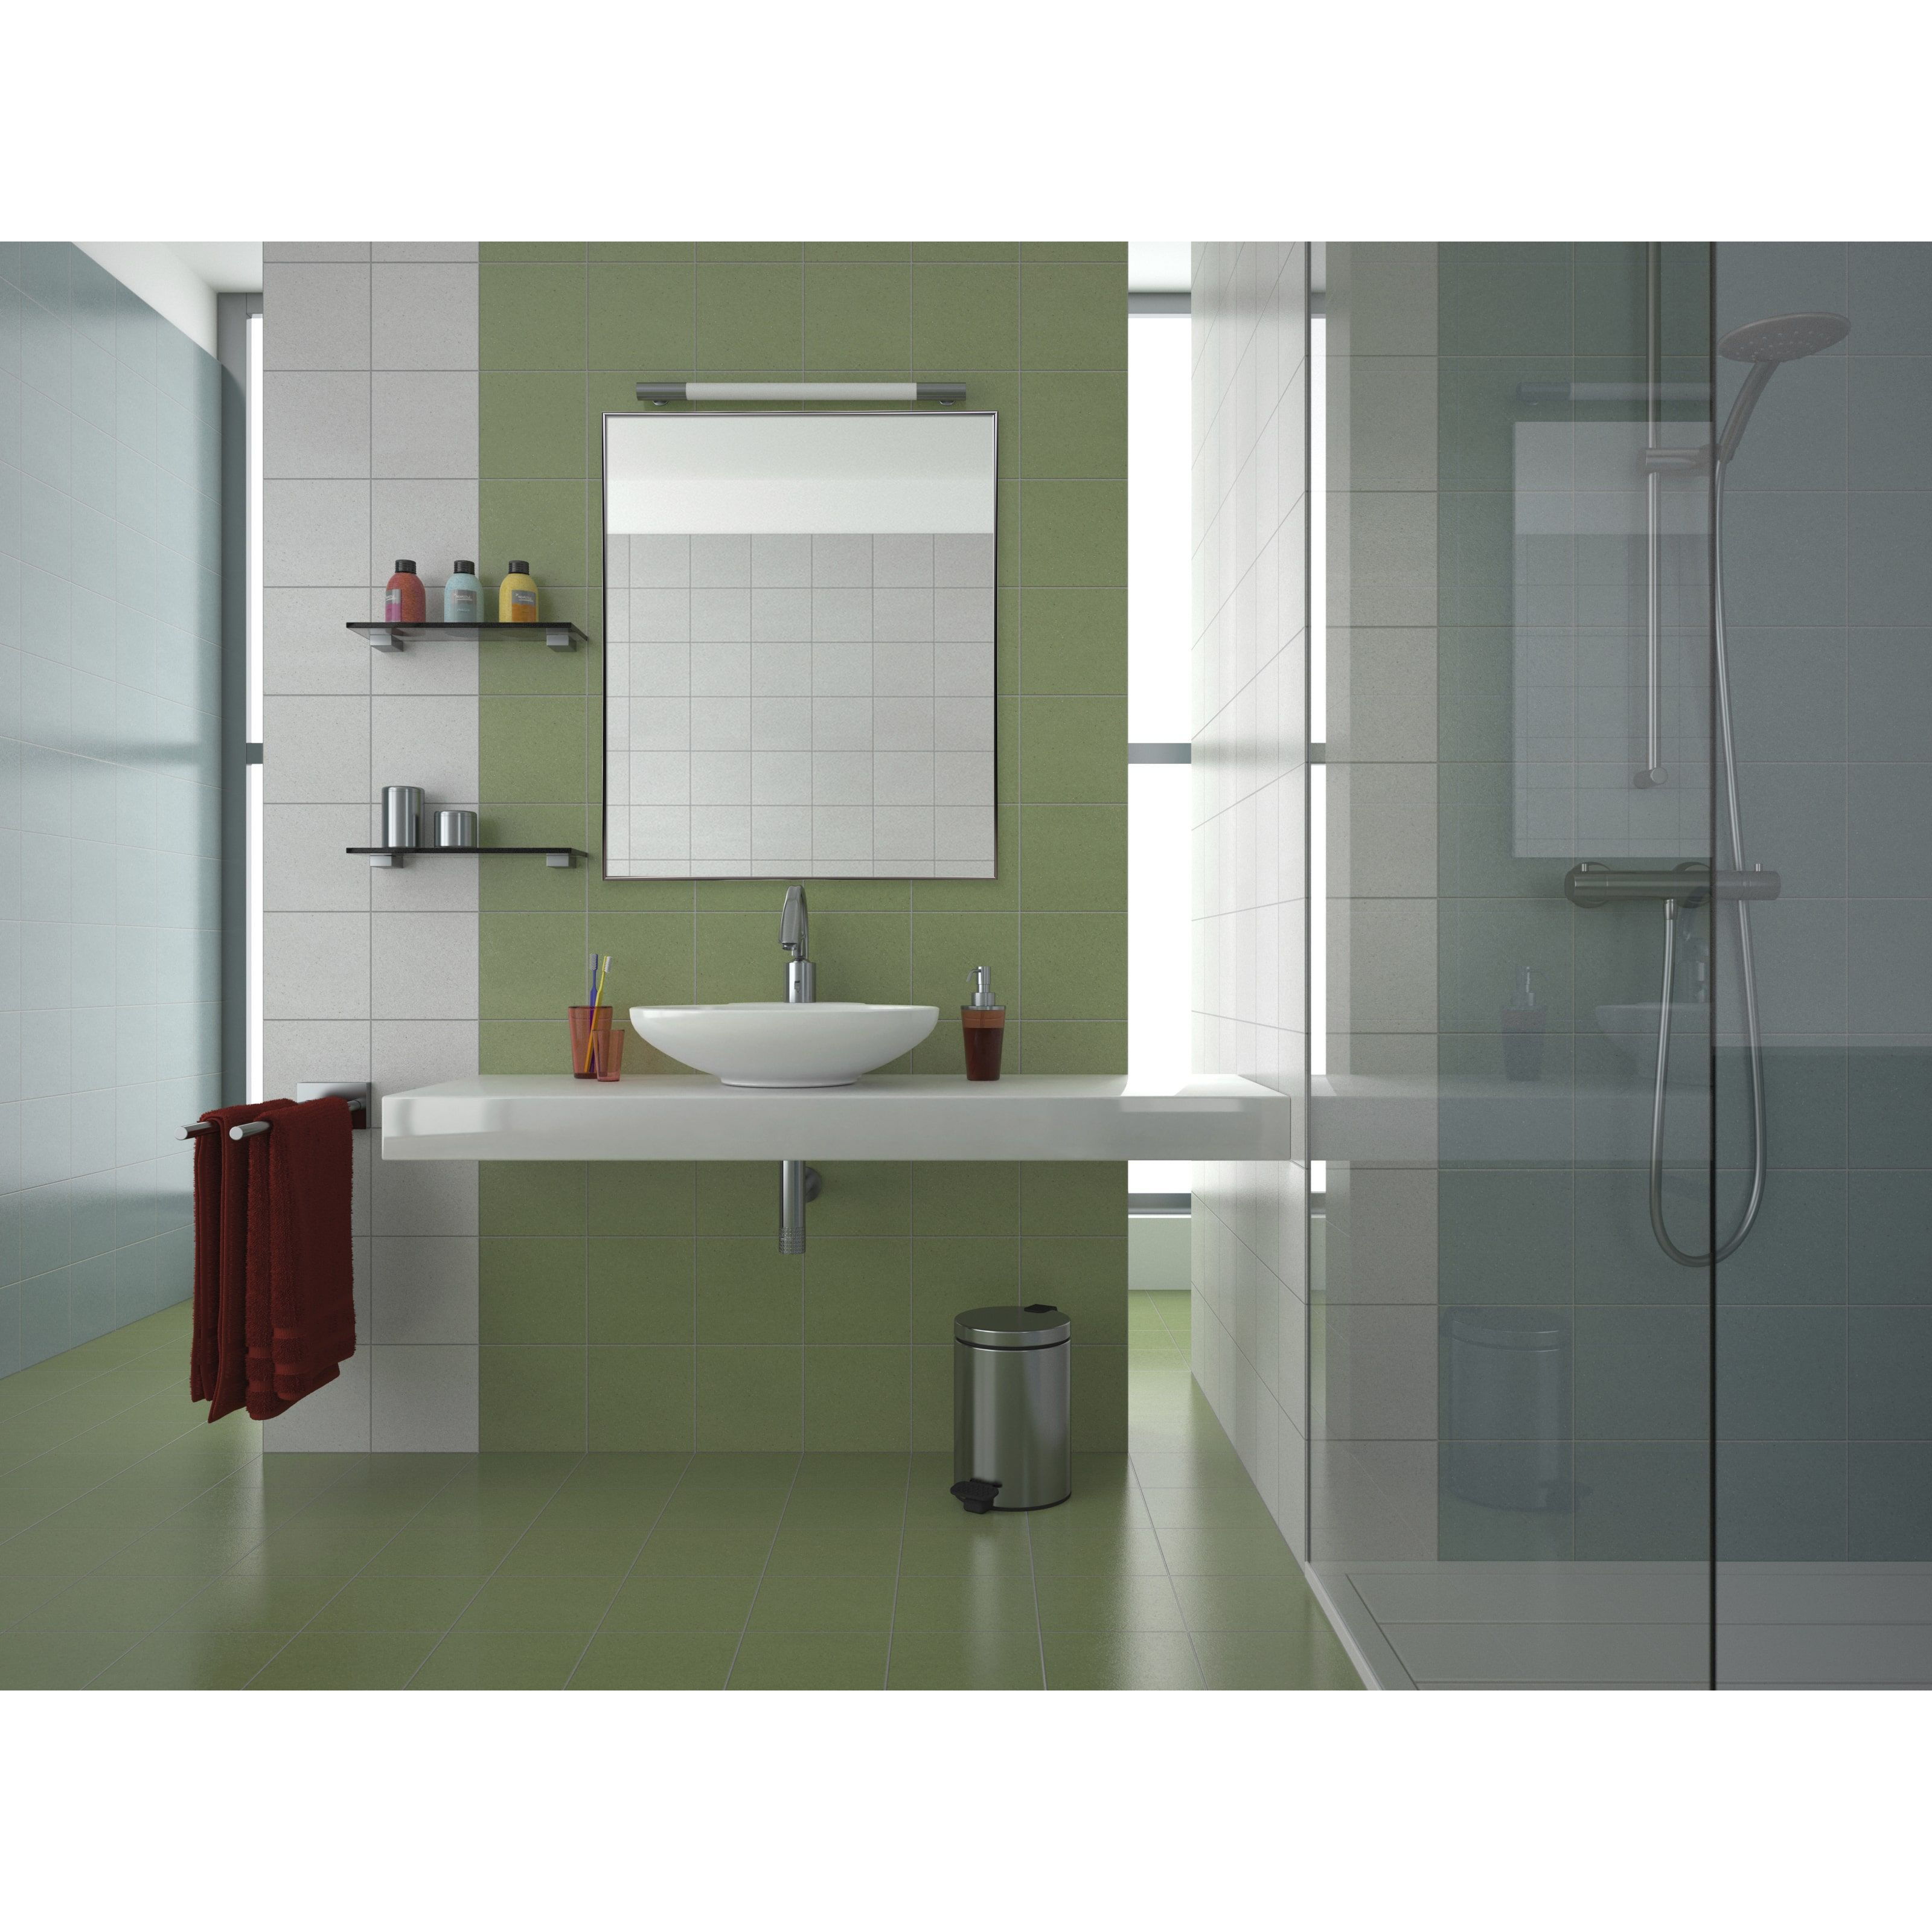 Aluminum Vanity Mirror With 3 8 Inch Molding 24 X 30